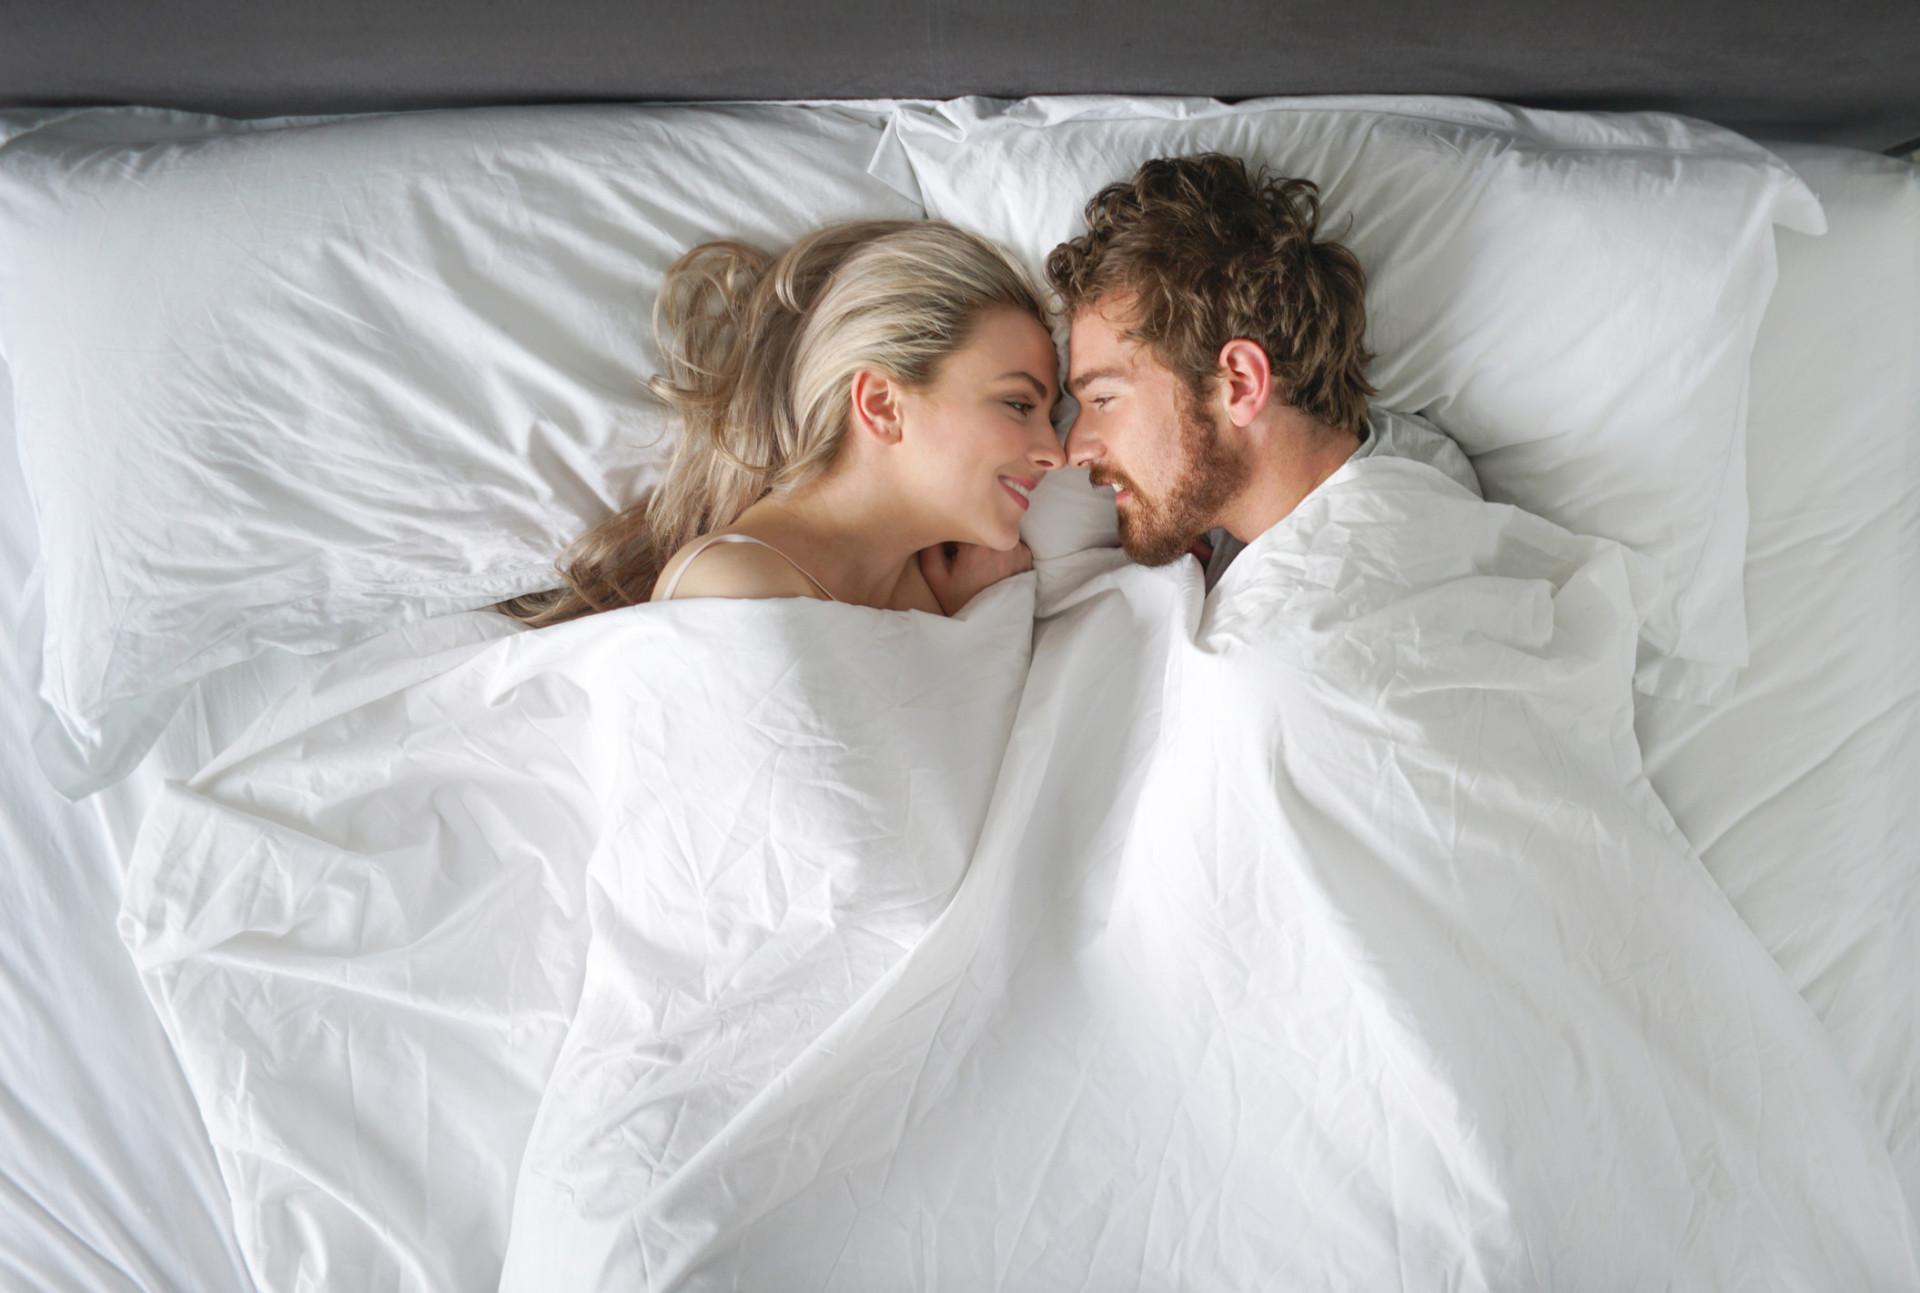 Dicas para aumentar a libido e esquentar o relacionamento